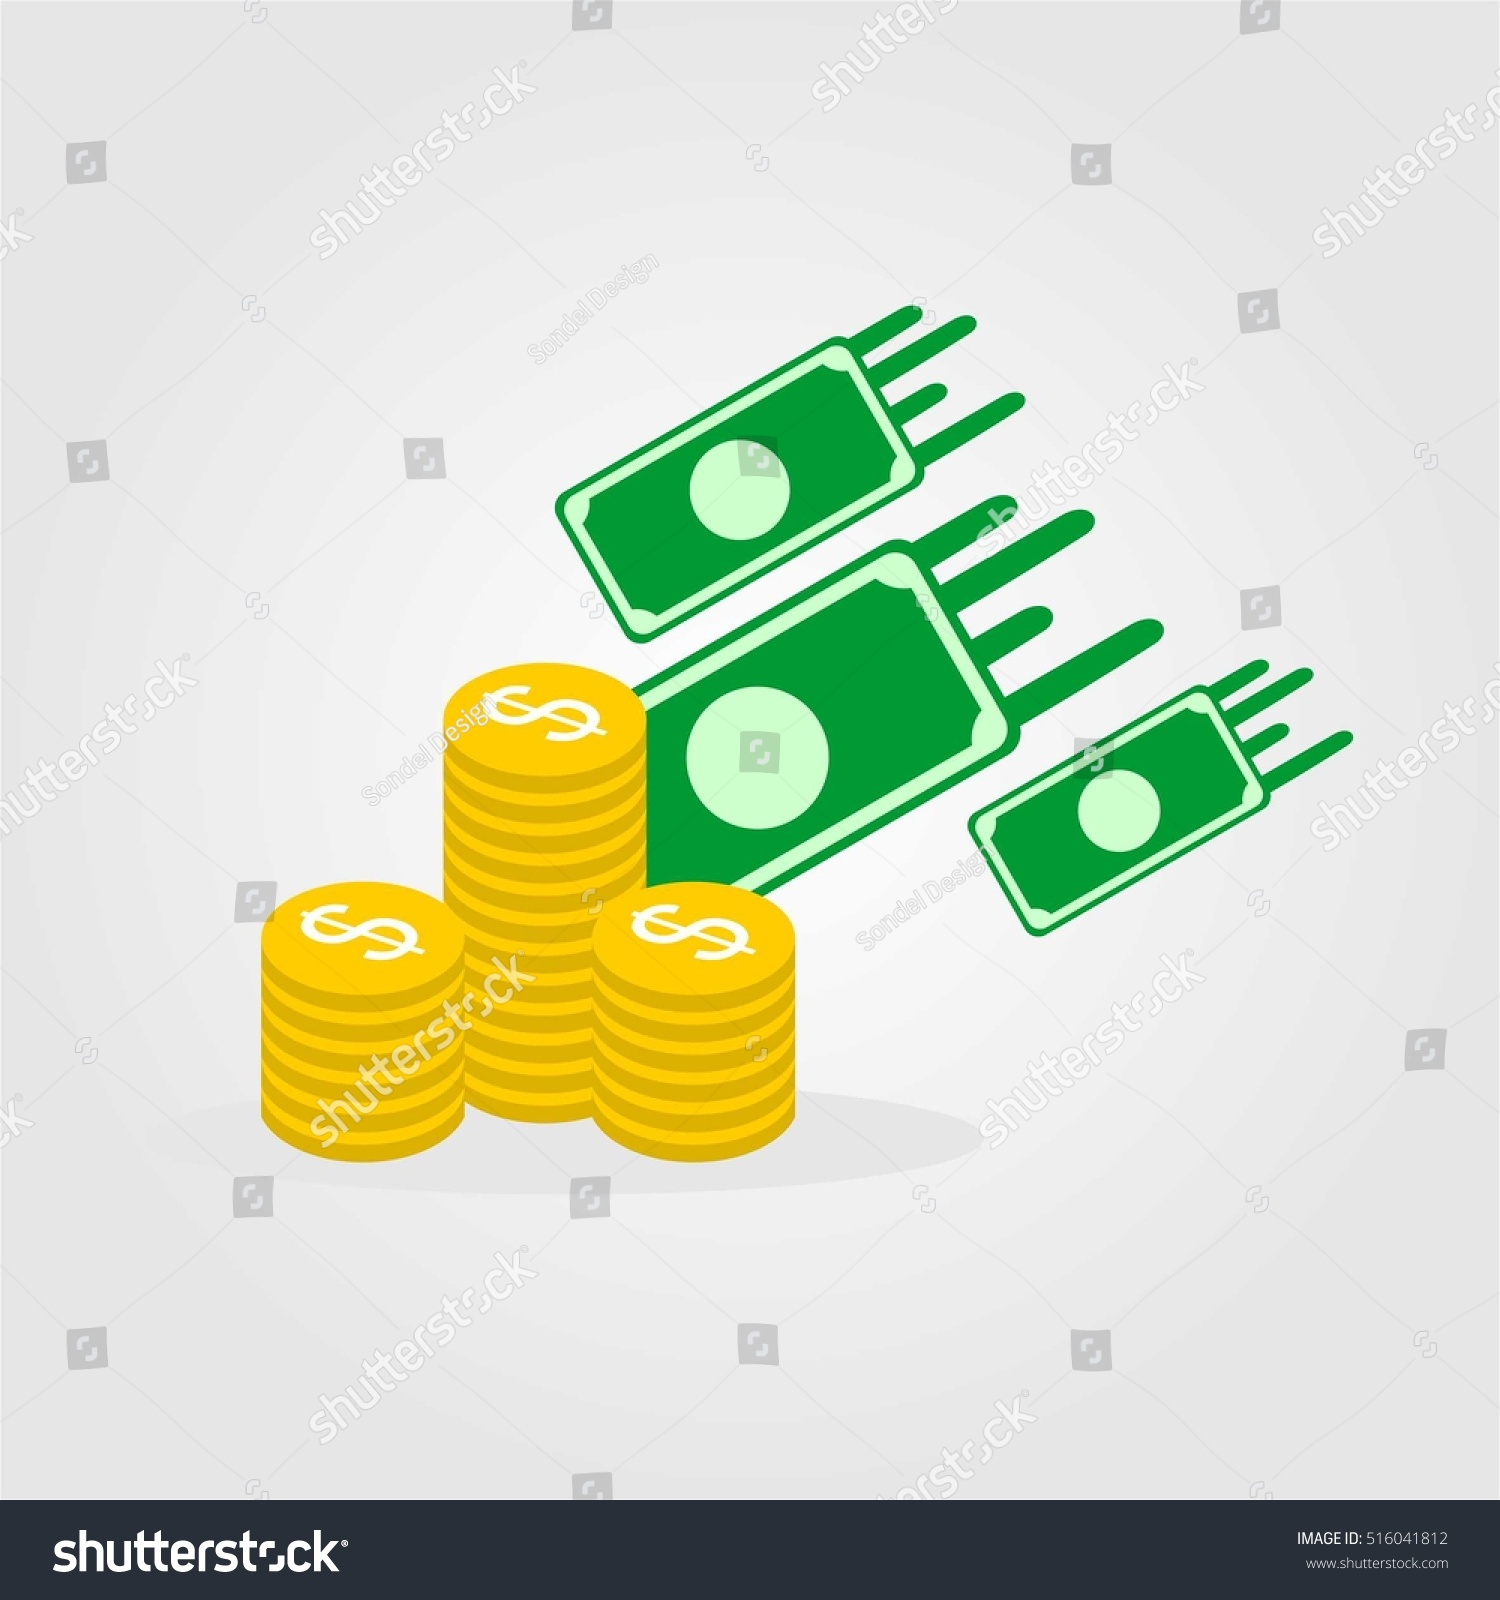 Finance Sign: Money Business Finance Company Logo Template Stock Vector